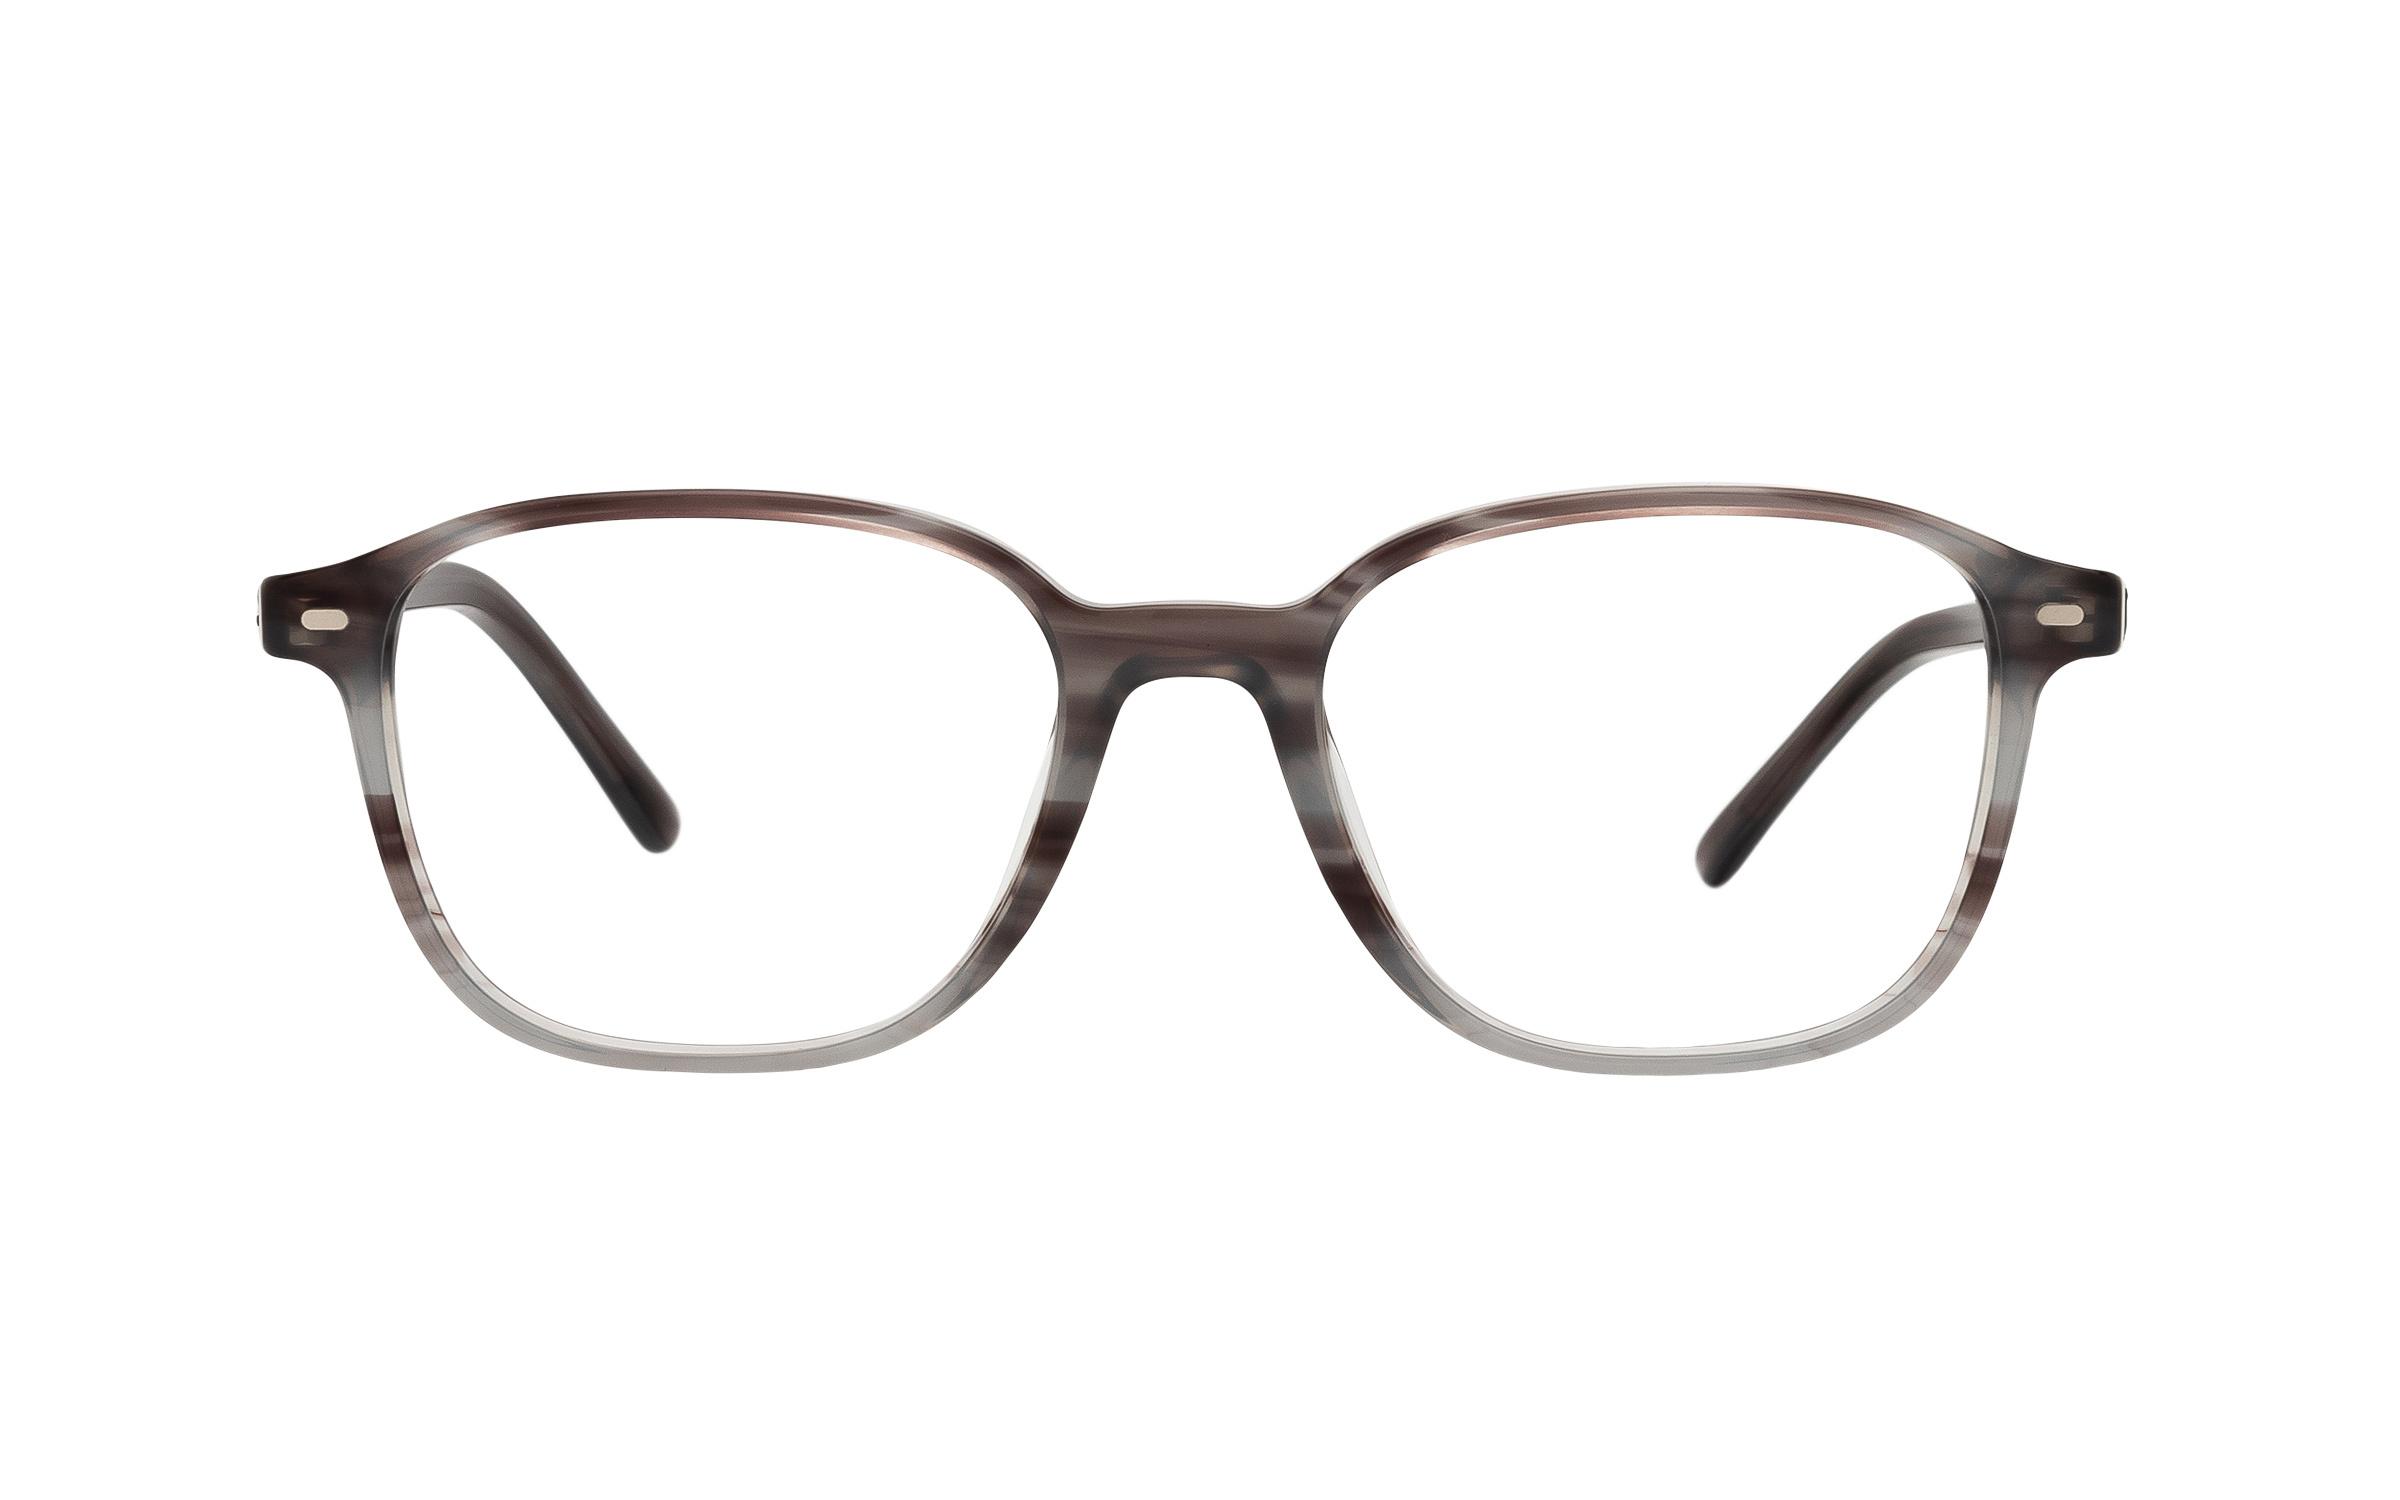 http://www.coastal.com/ - Ray-Ban Leonard RX5393 8055 (49) Eyeglasses and Frame in Striped Grey | Metal – Online Coastal